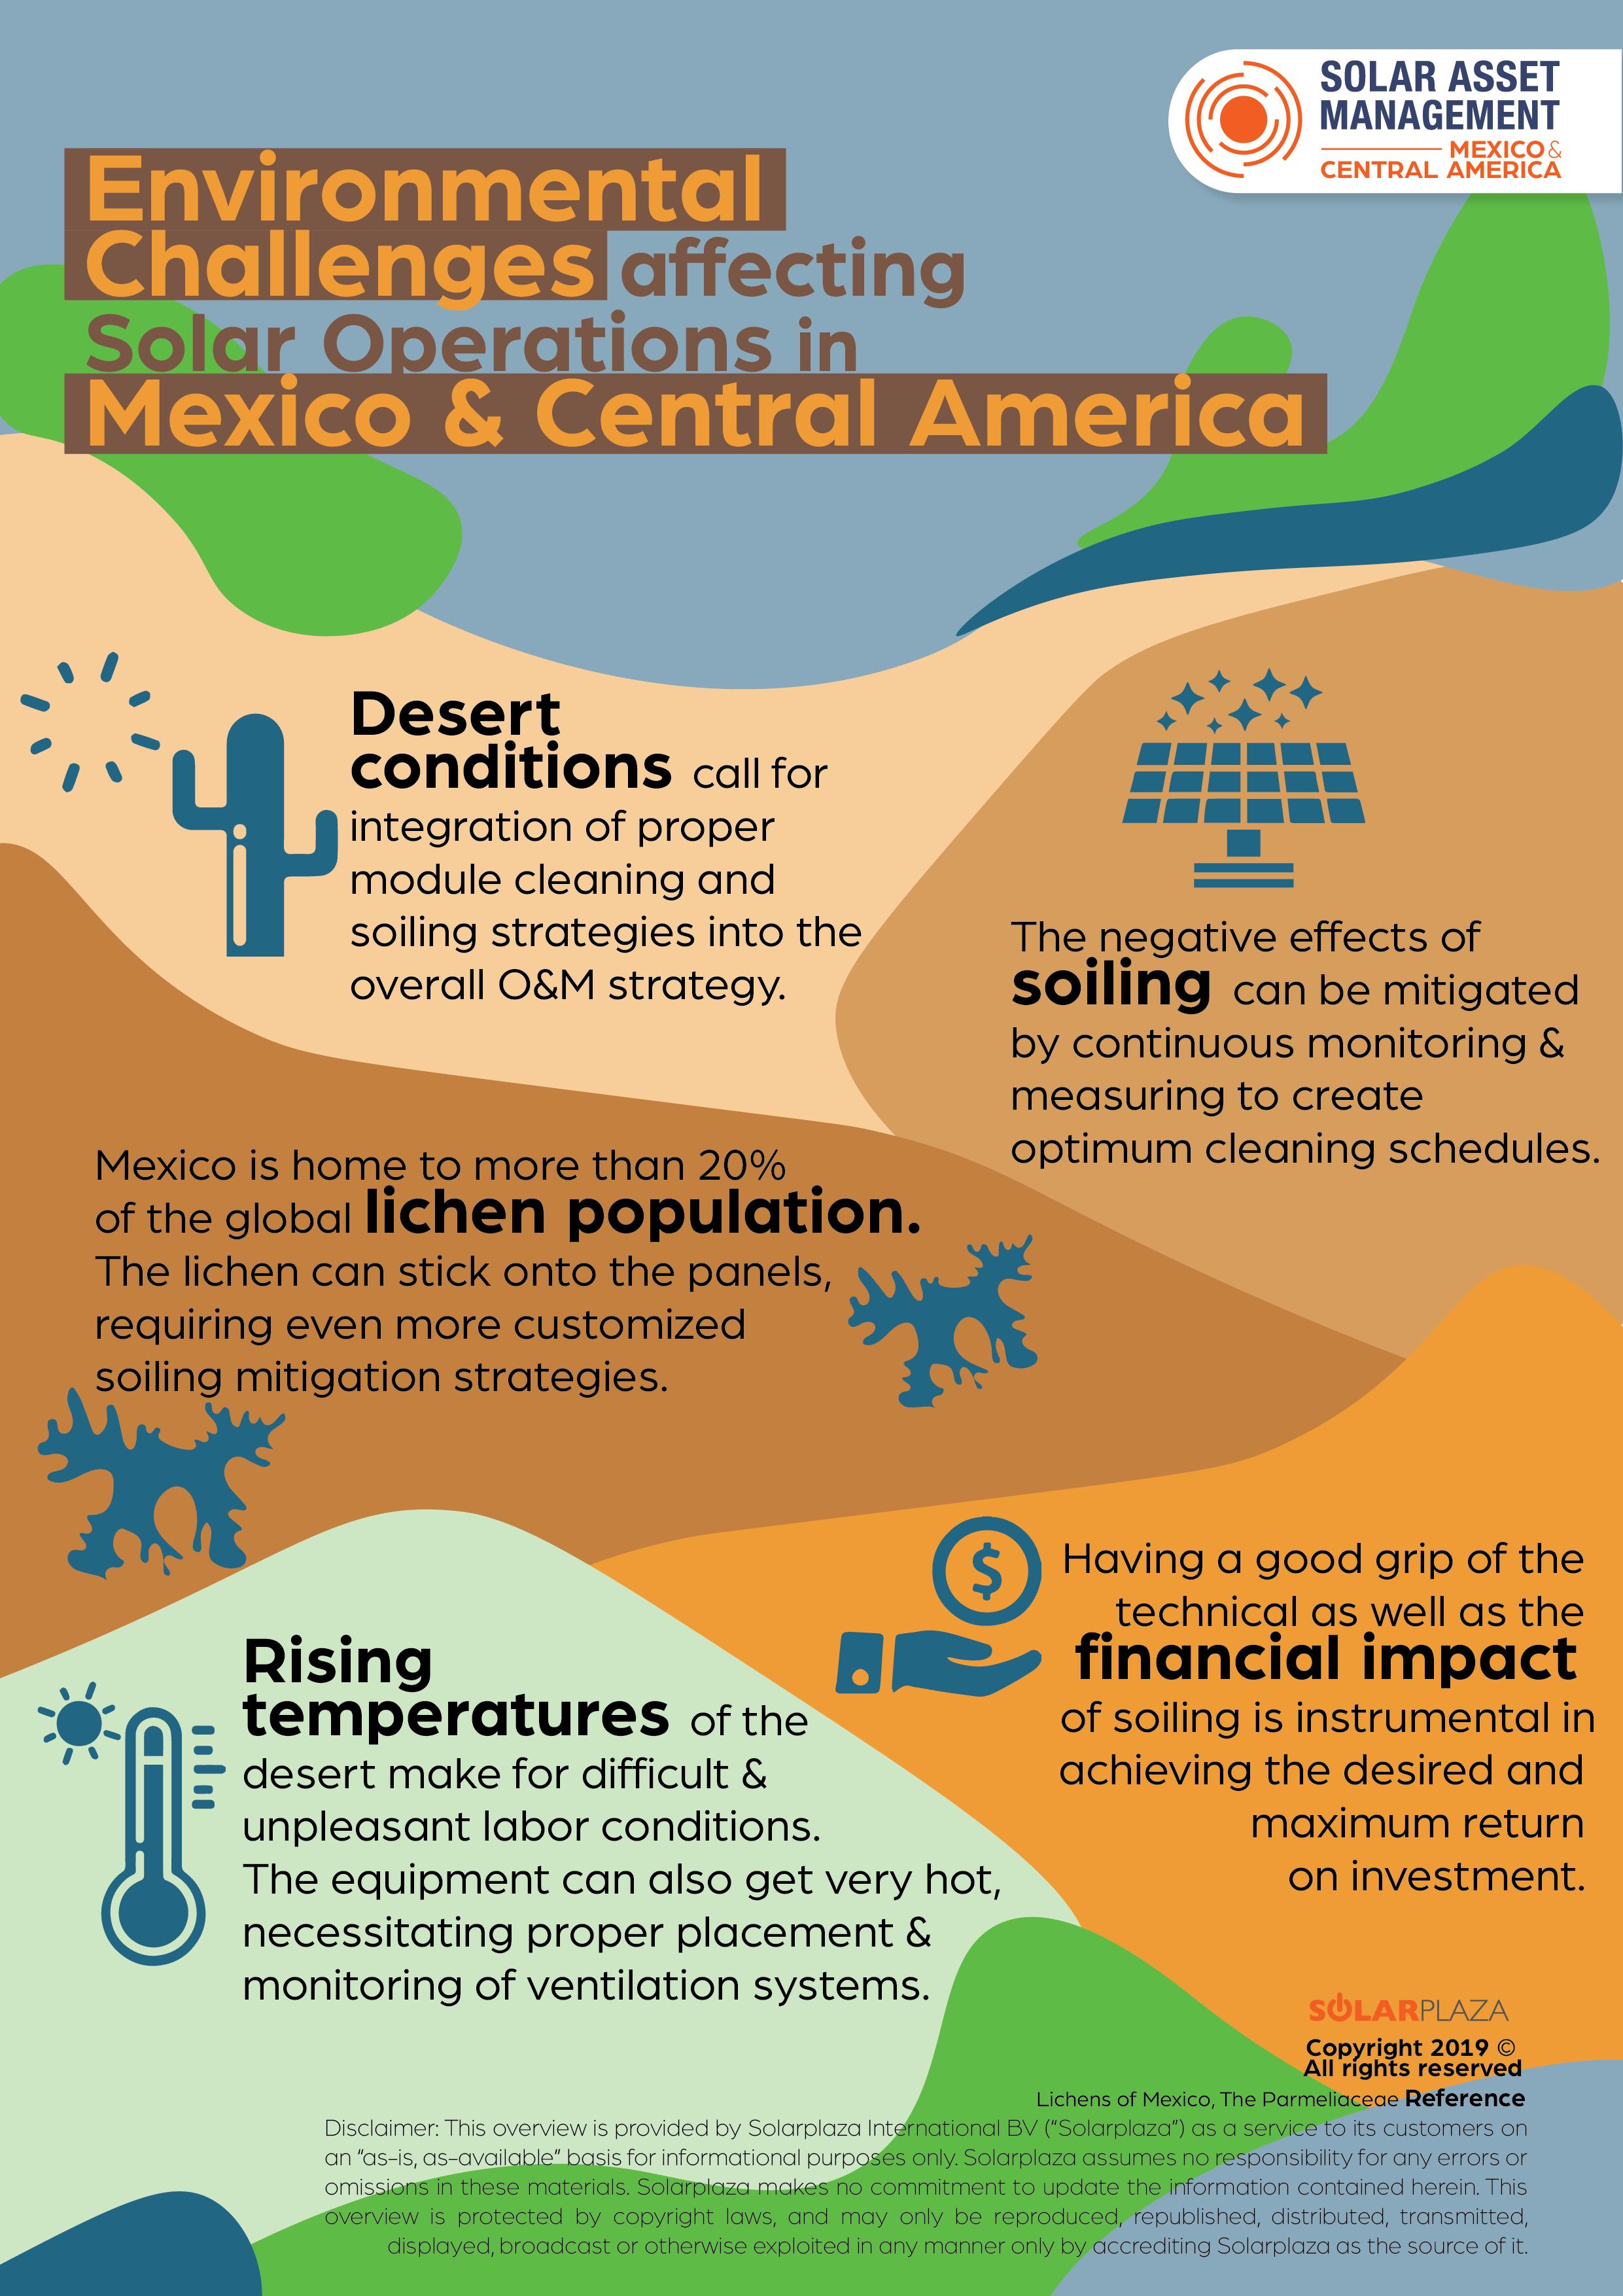 SAM MCA 19 - Enviromental challenges Infographic 1.1.png